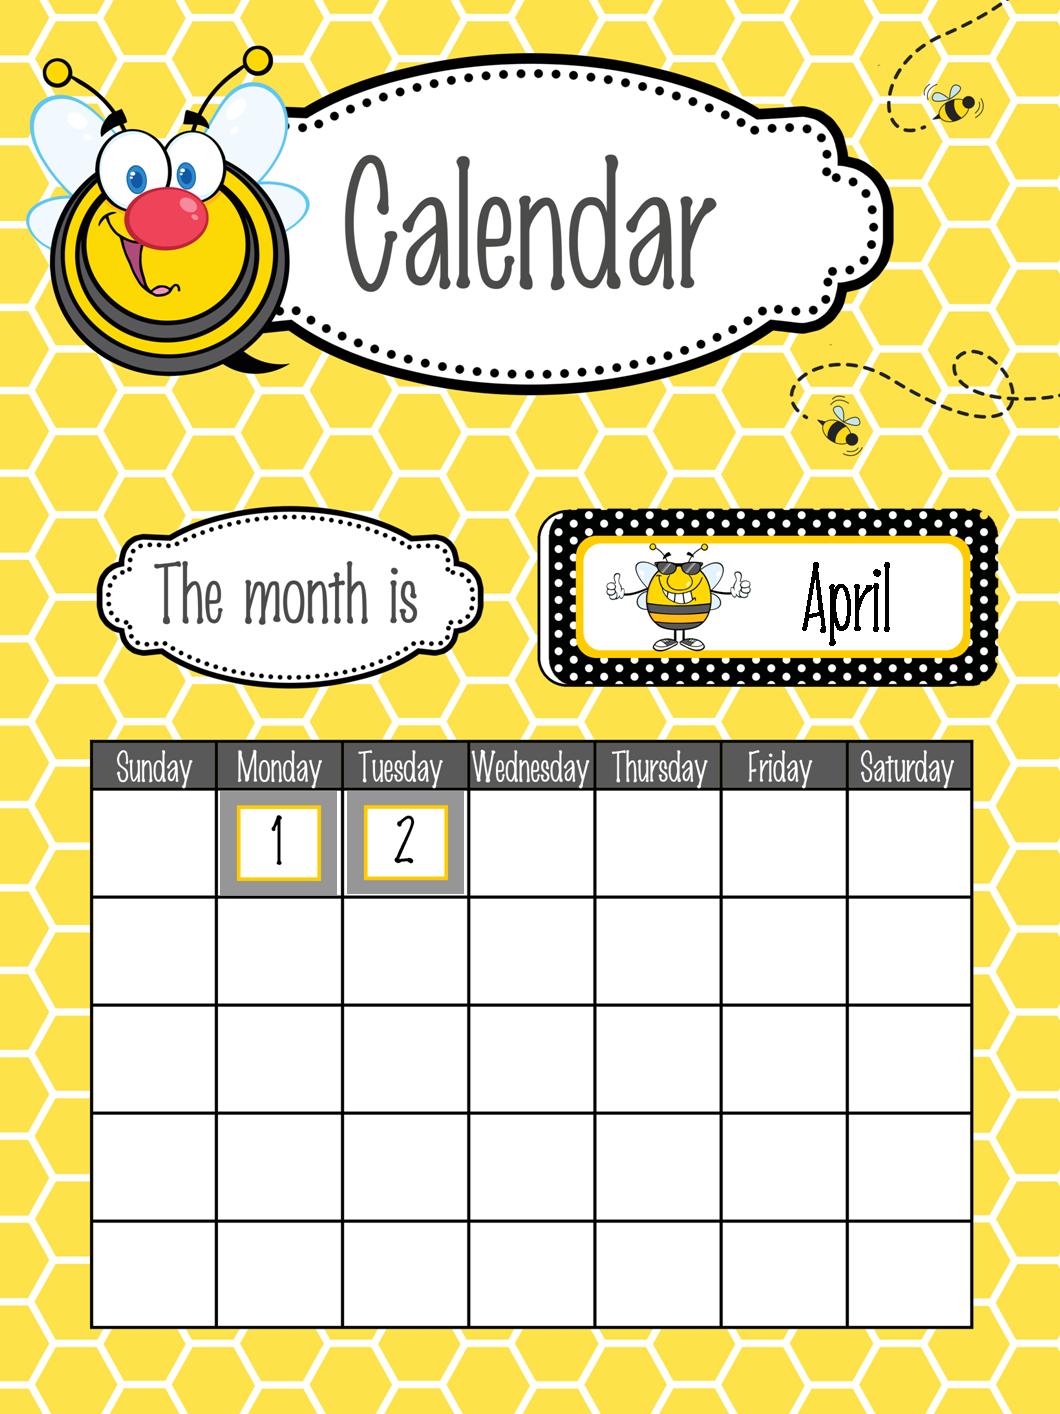 Typography Calendar Download : Bees classroom decor calendar set poster fonts bee